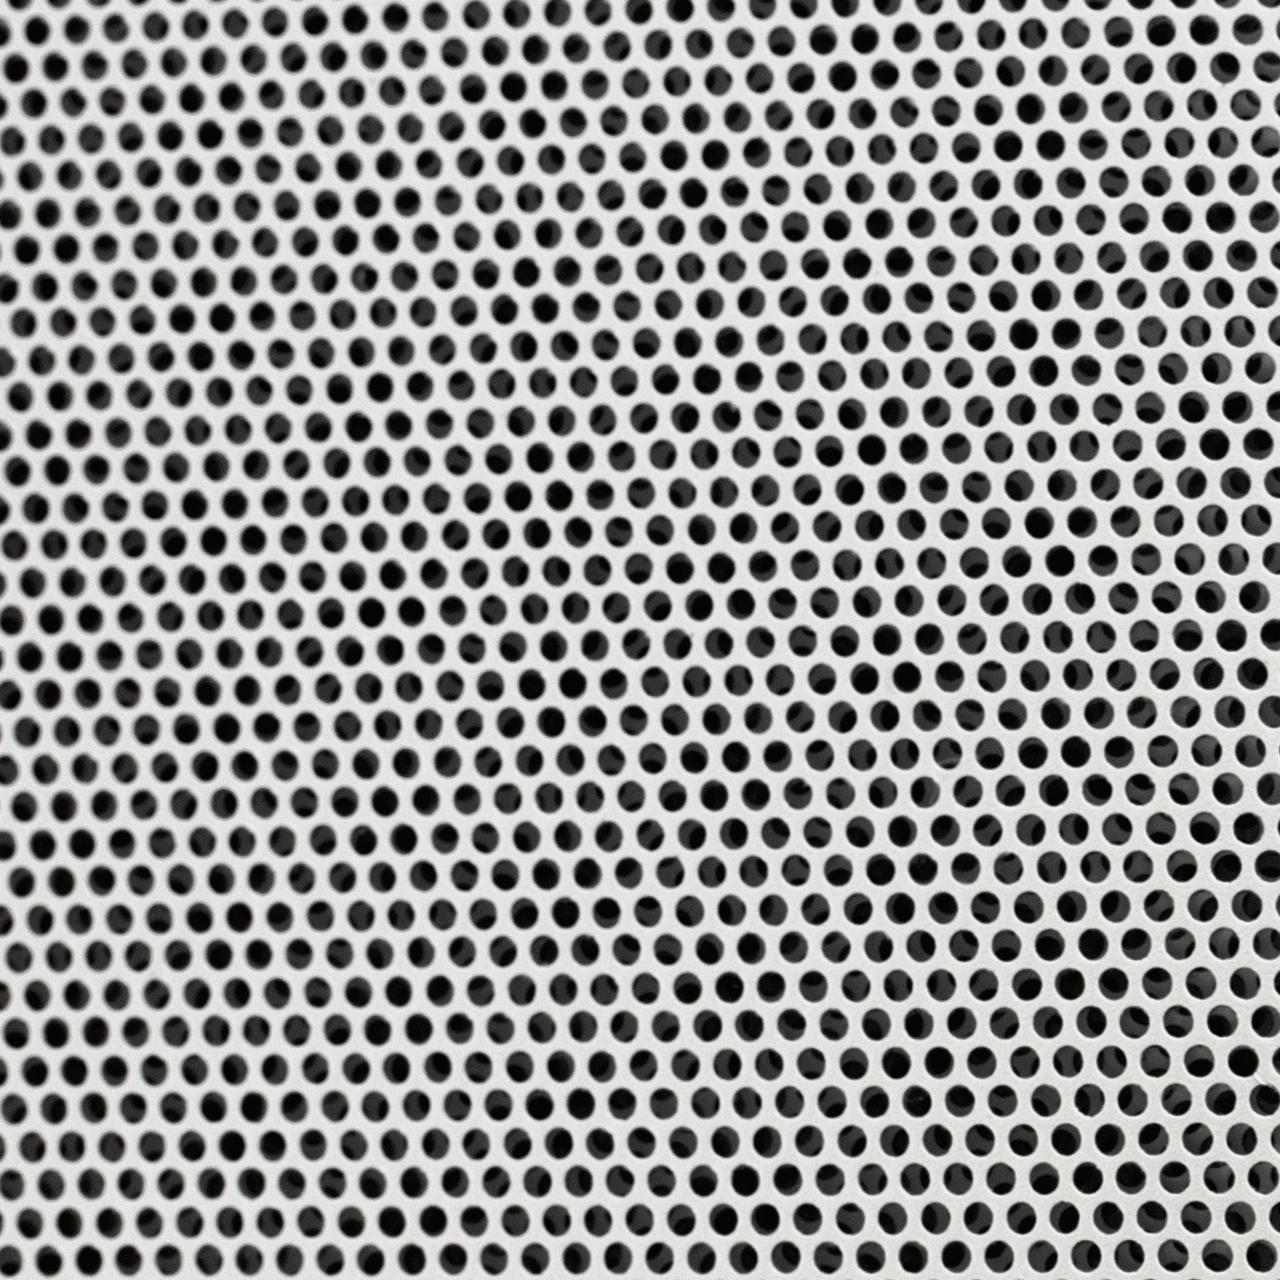 Vinyle Perfor 233 View Through Produits Impression